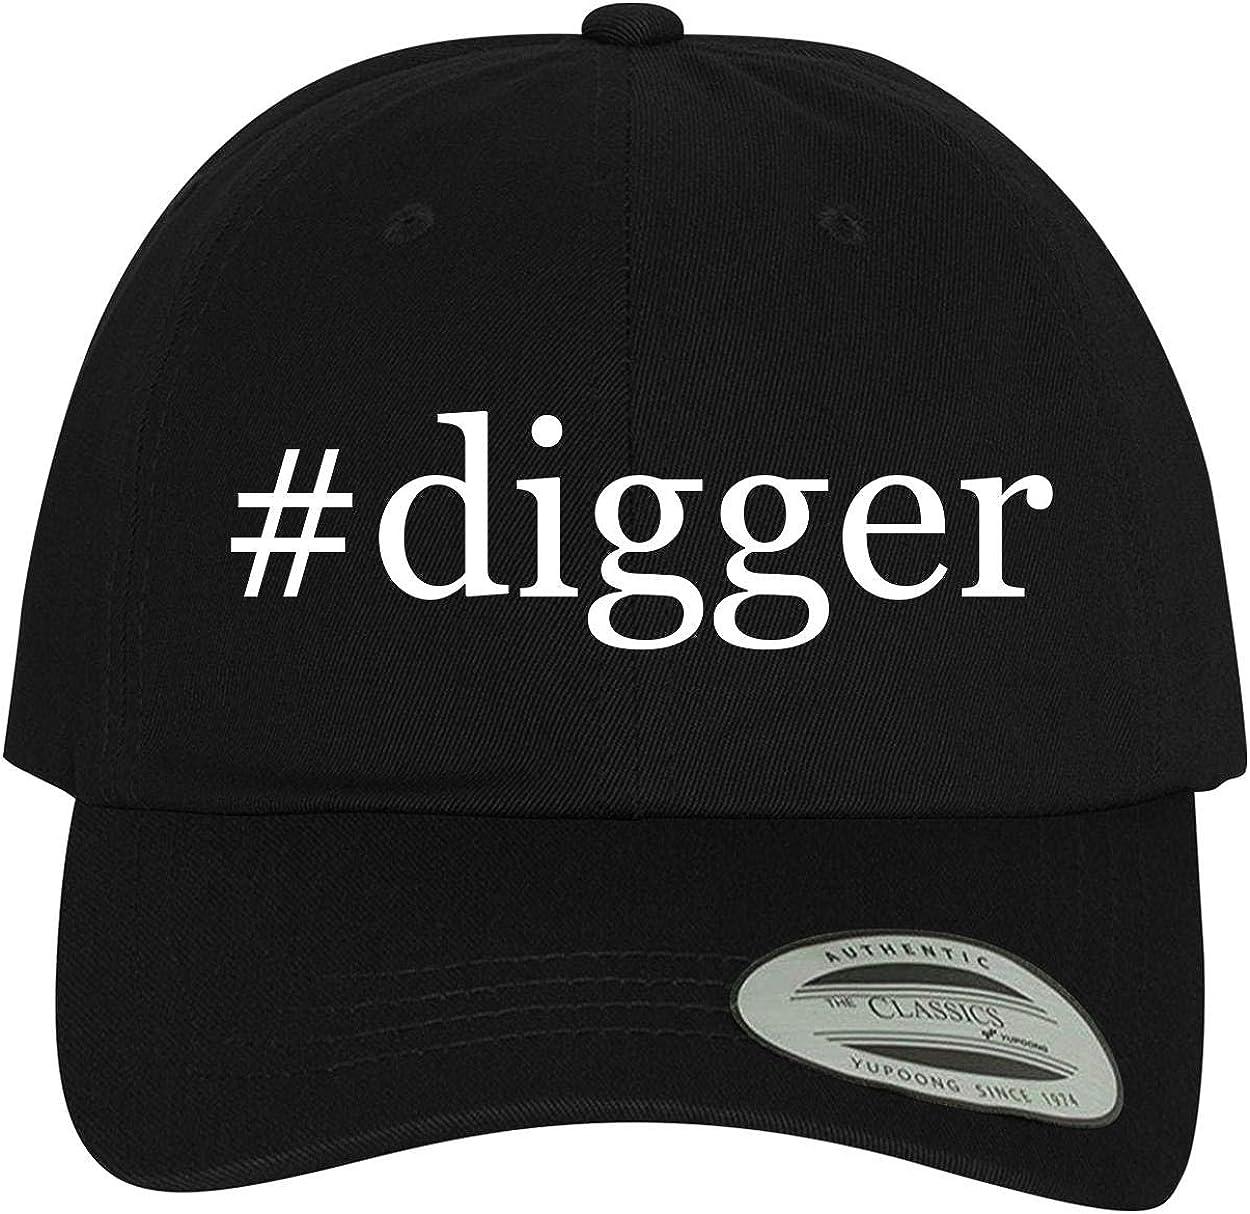 Comfortable Dad Hat Baseball Cap BH Cool Designs #Digger